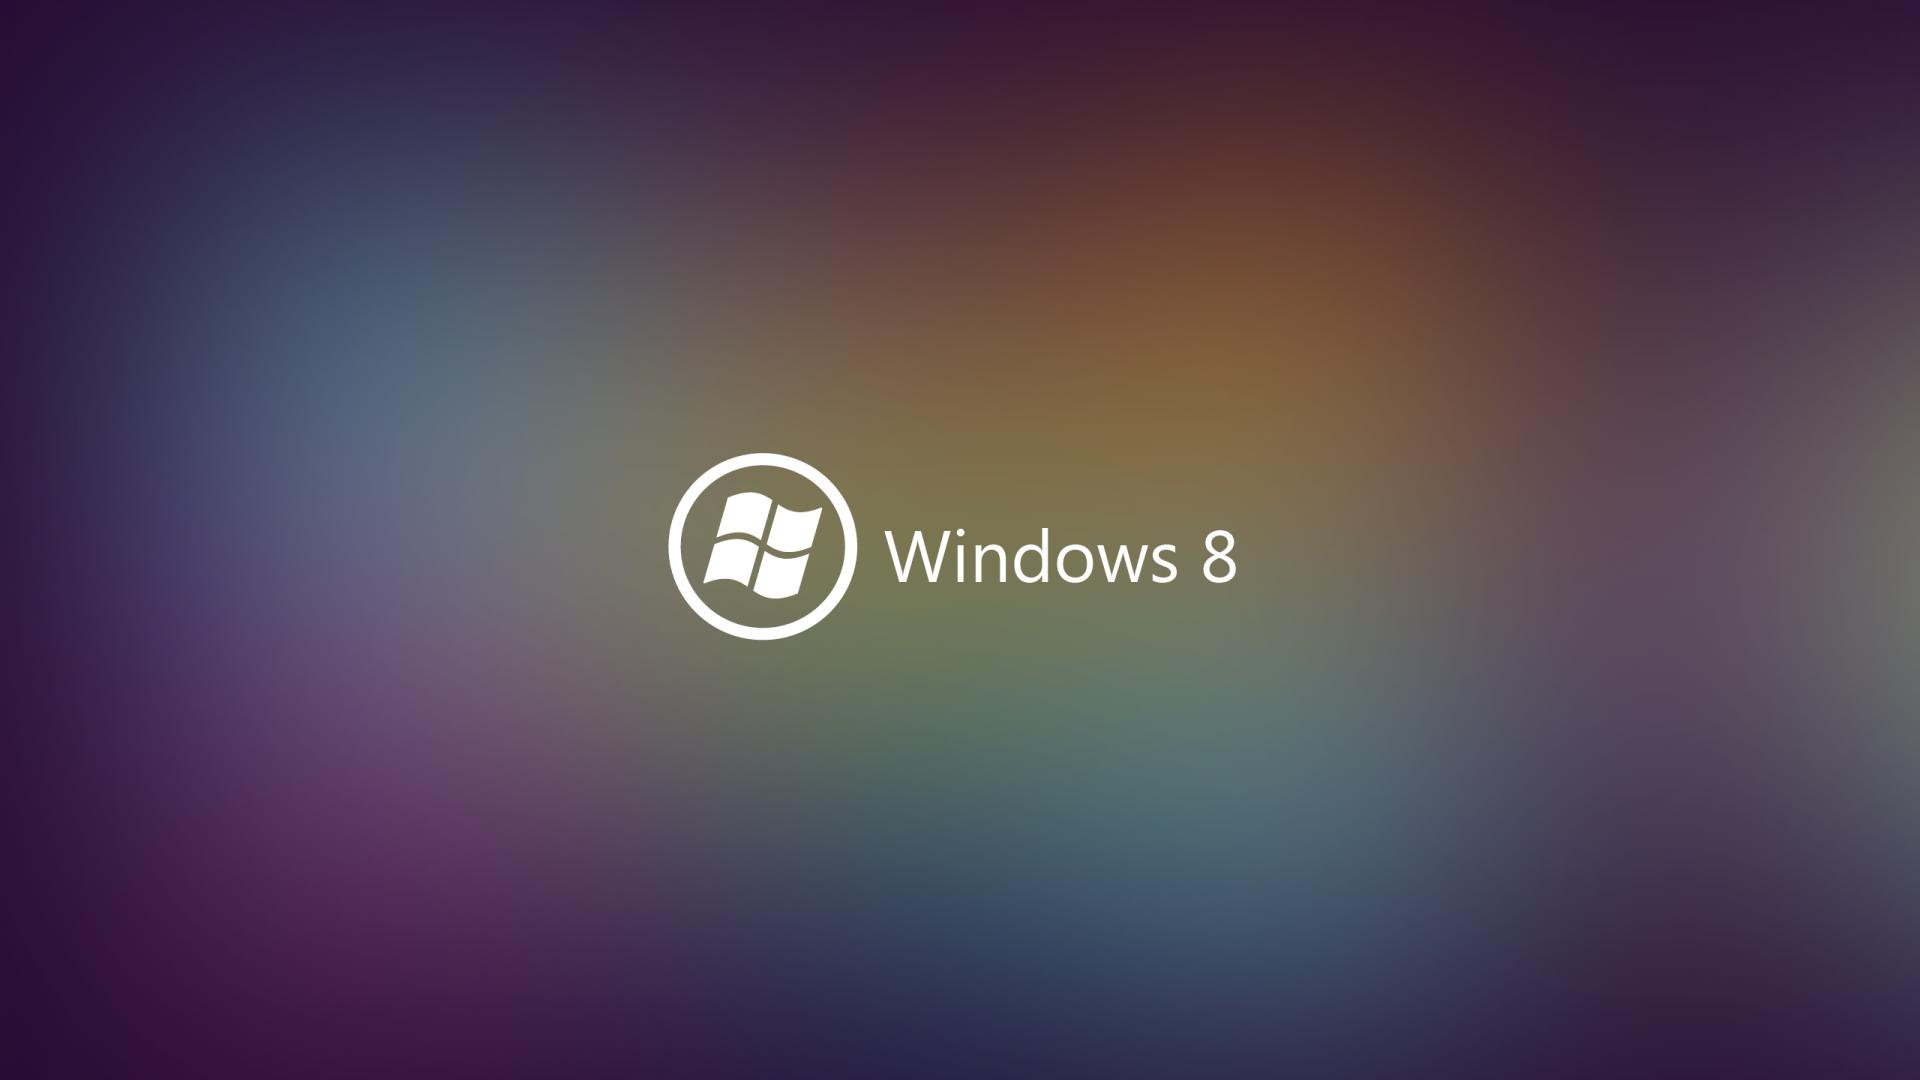 Multicolor Windows 8 Wallpaper